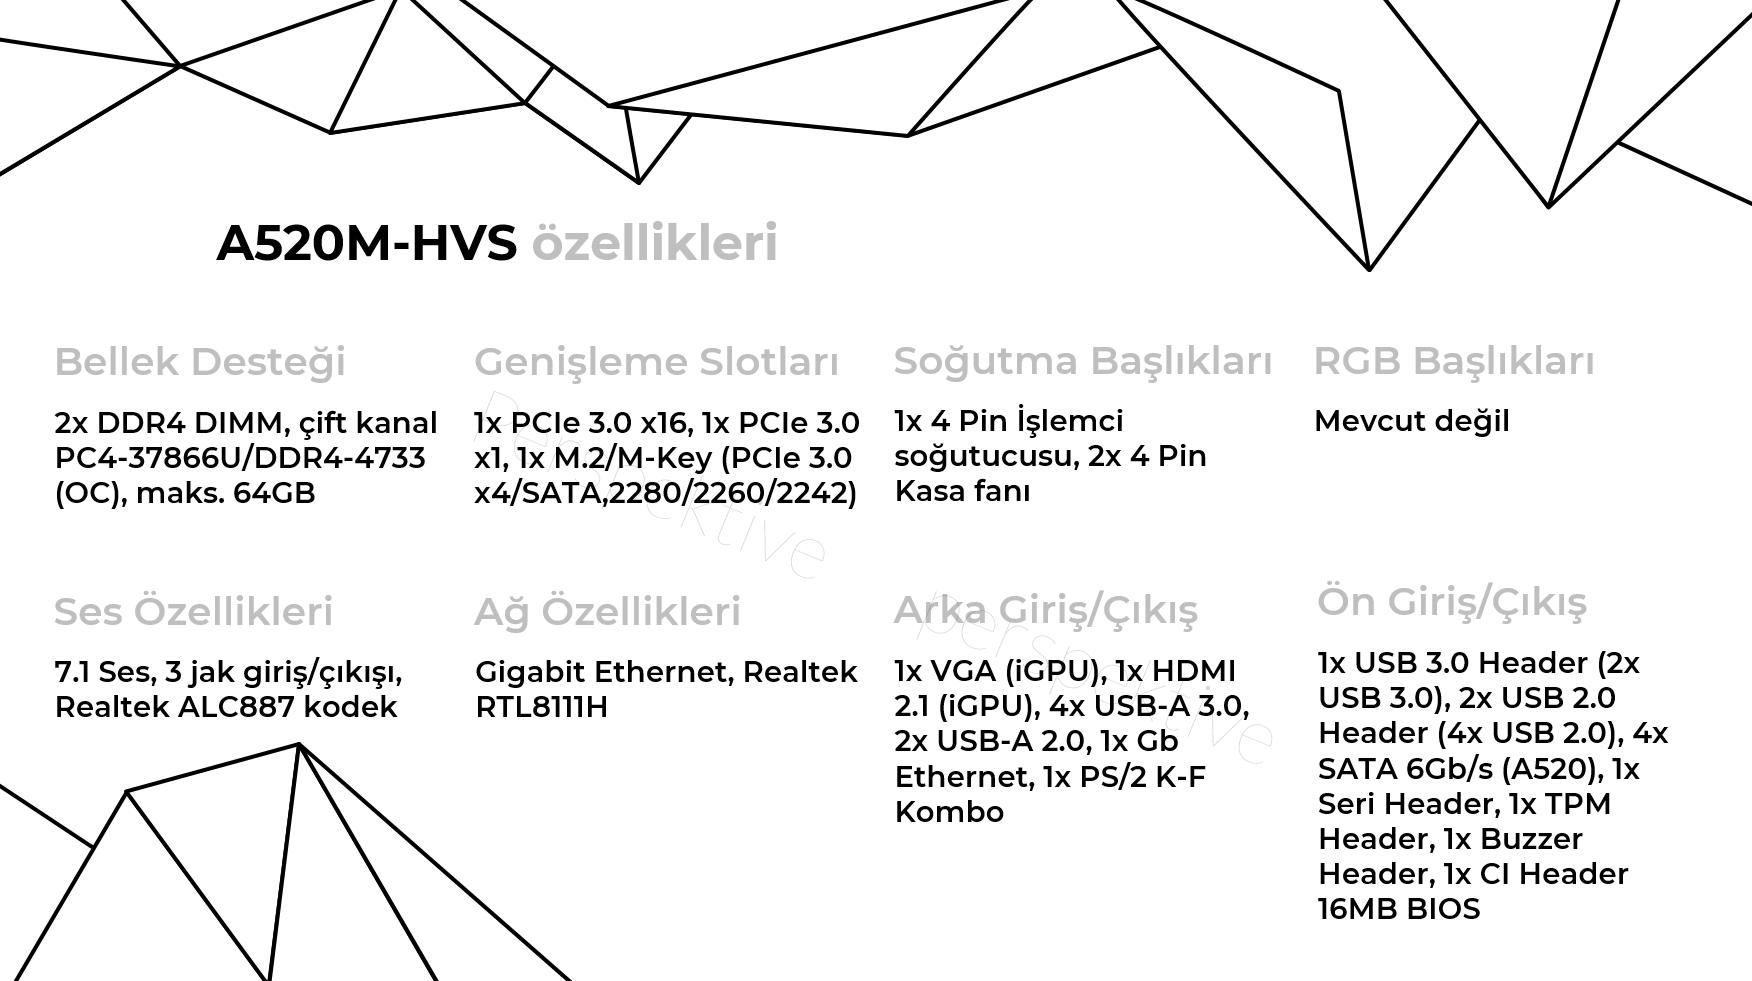 hvs2.png